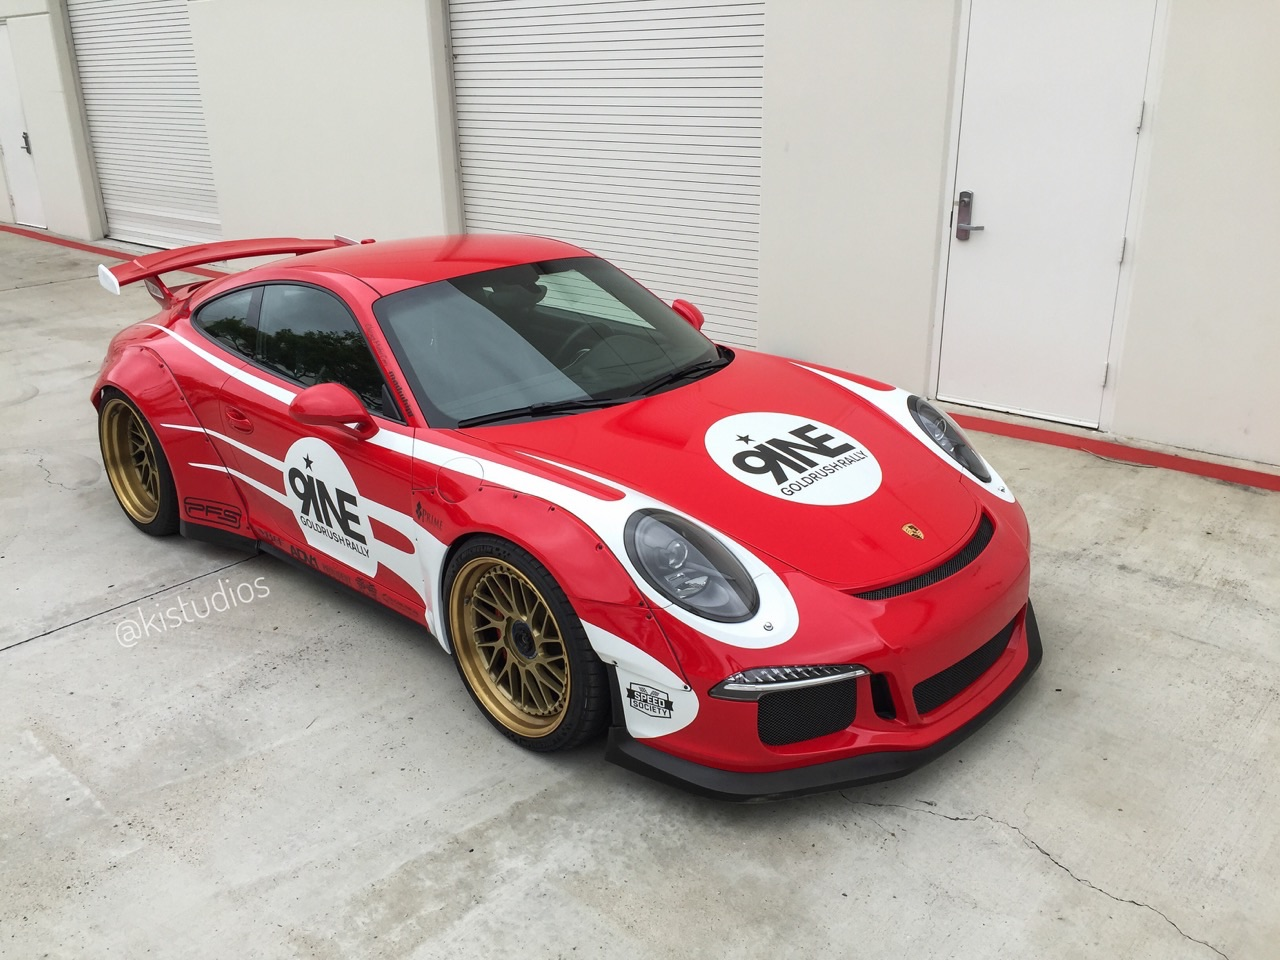 Platinum Motorcars Detroit Libertywalk Widebody Porsche 991 GT3